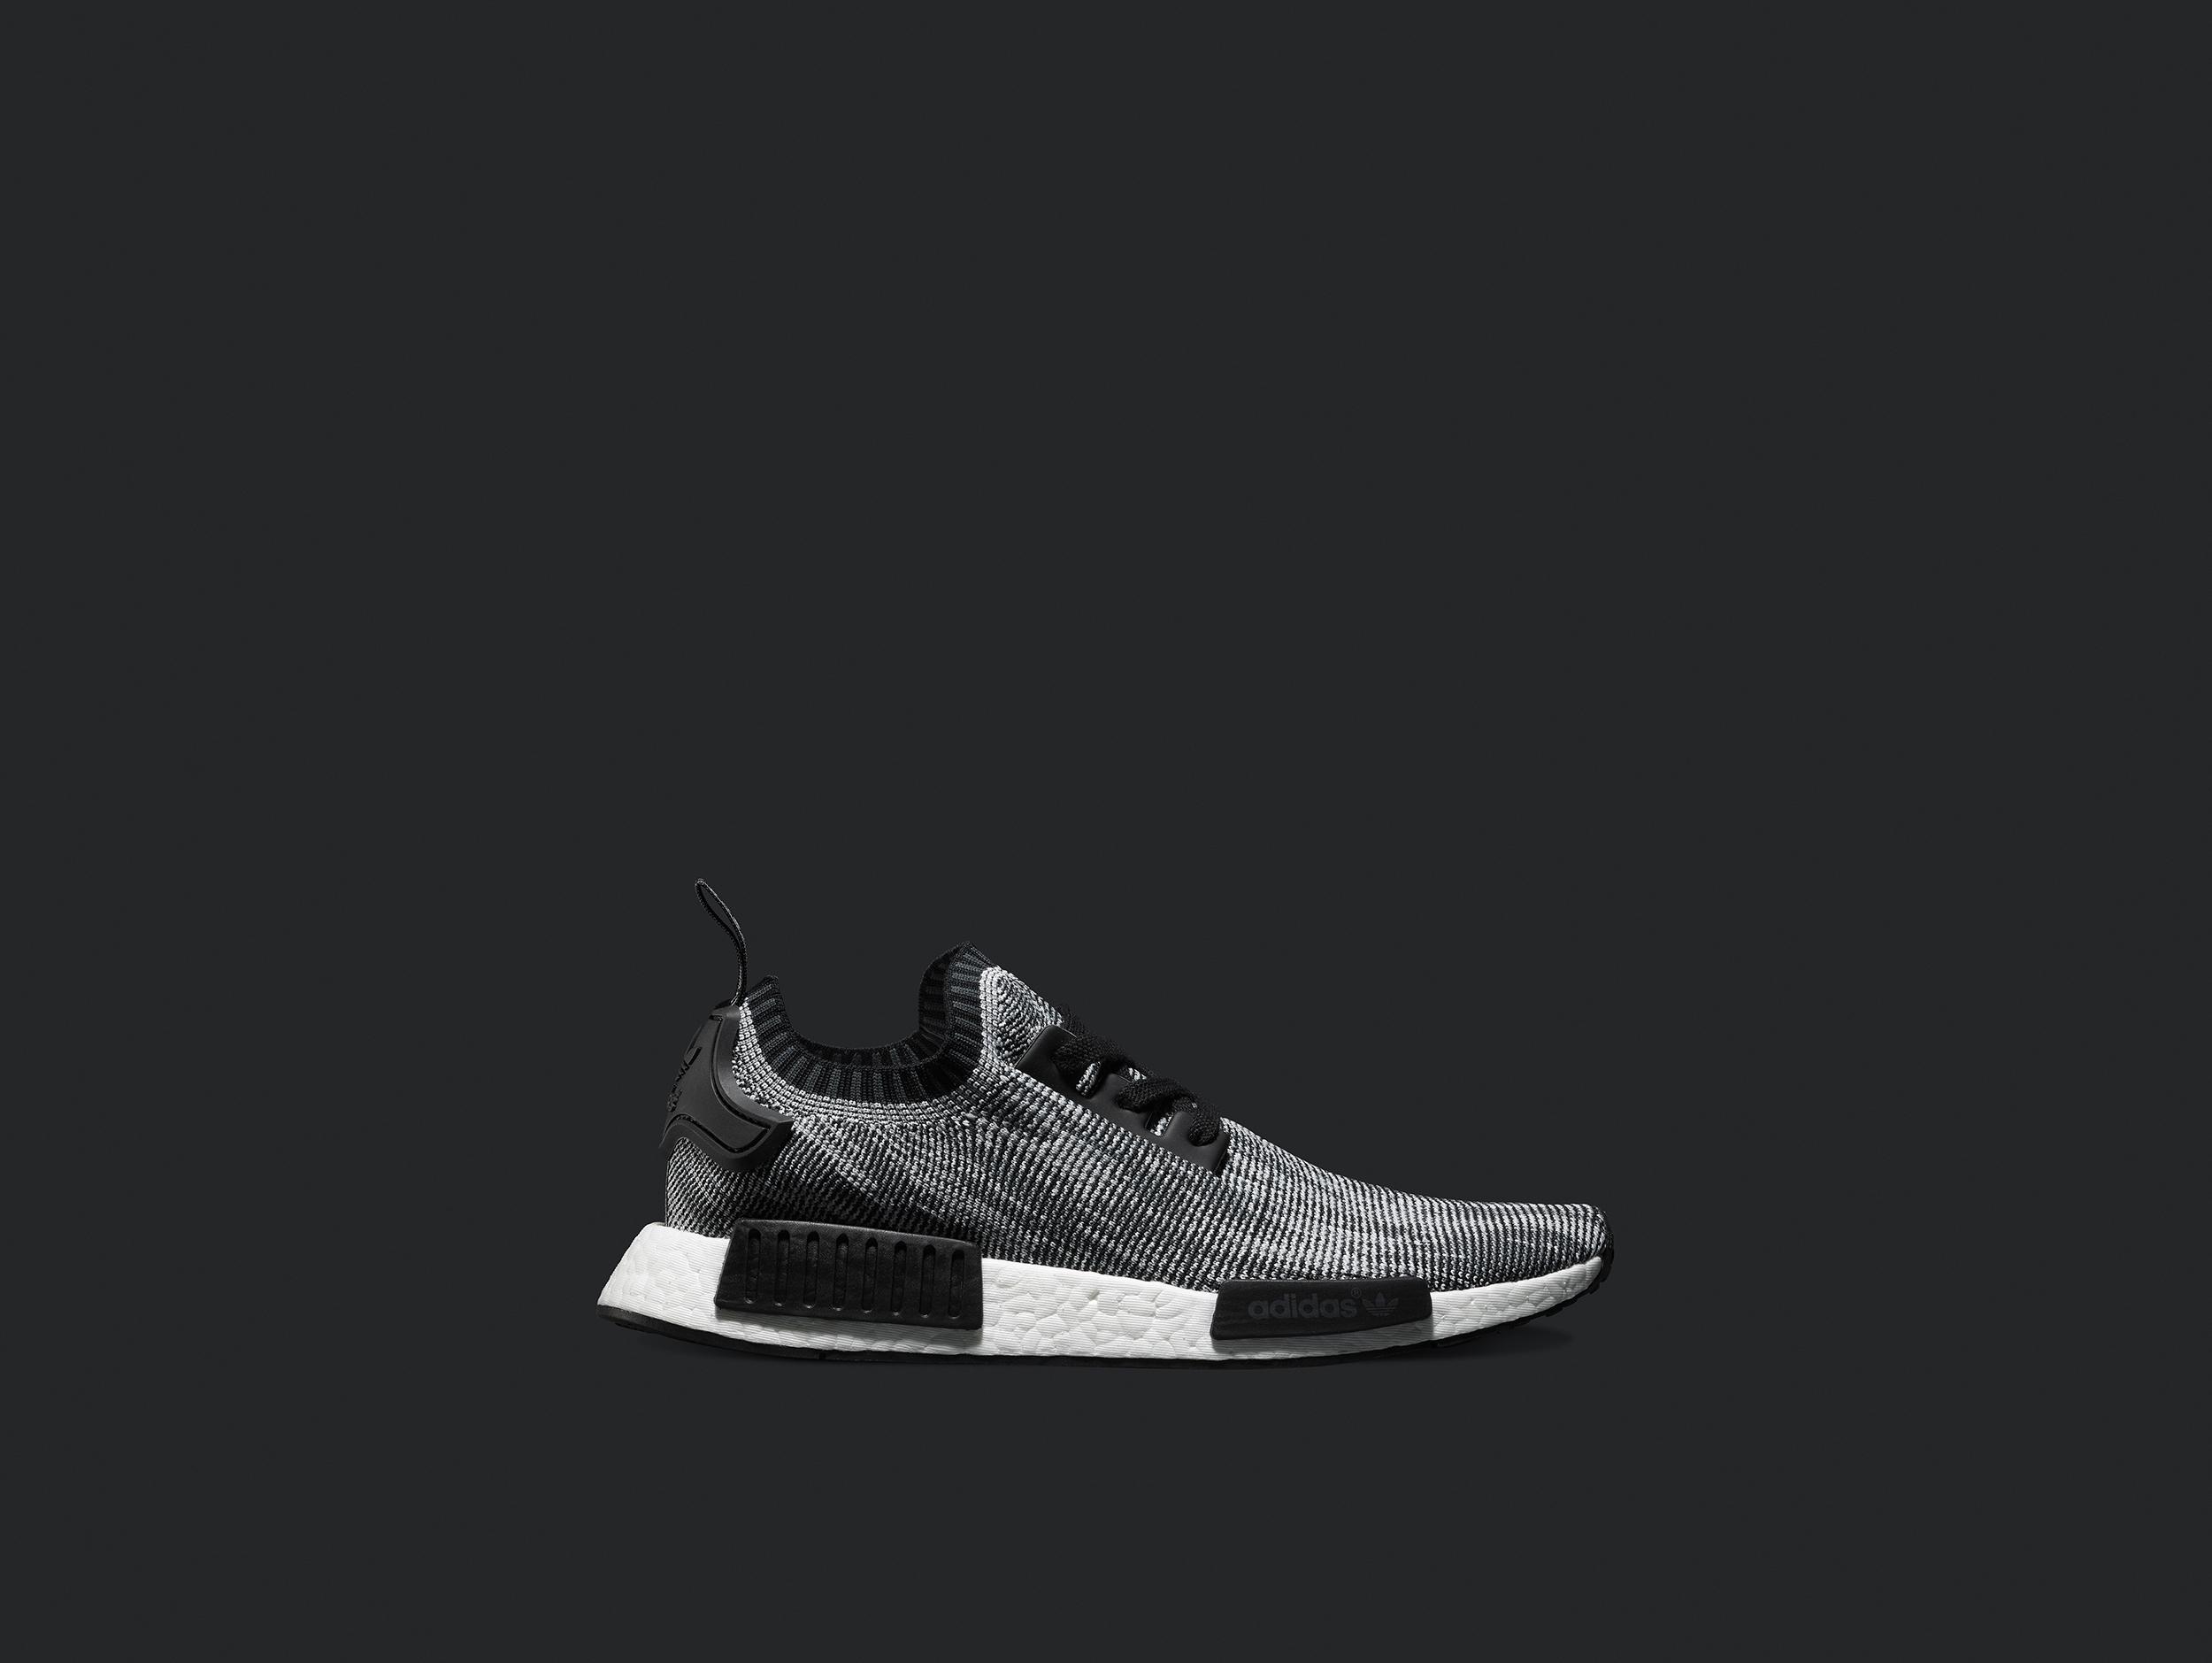 Adidas Ultra Boost Nmd